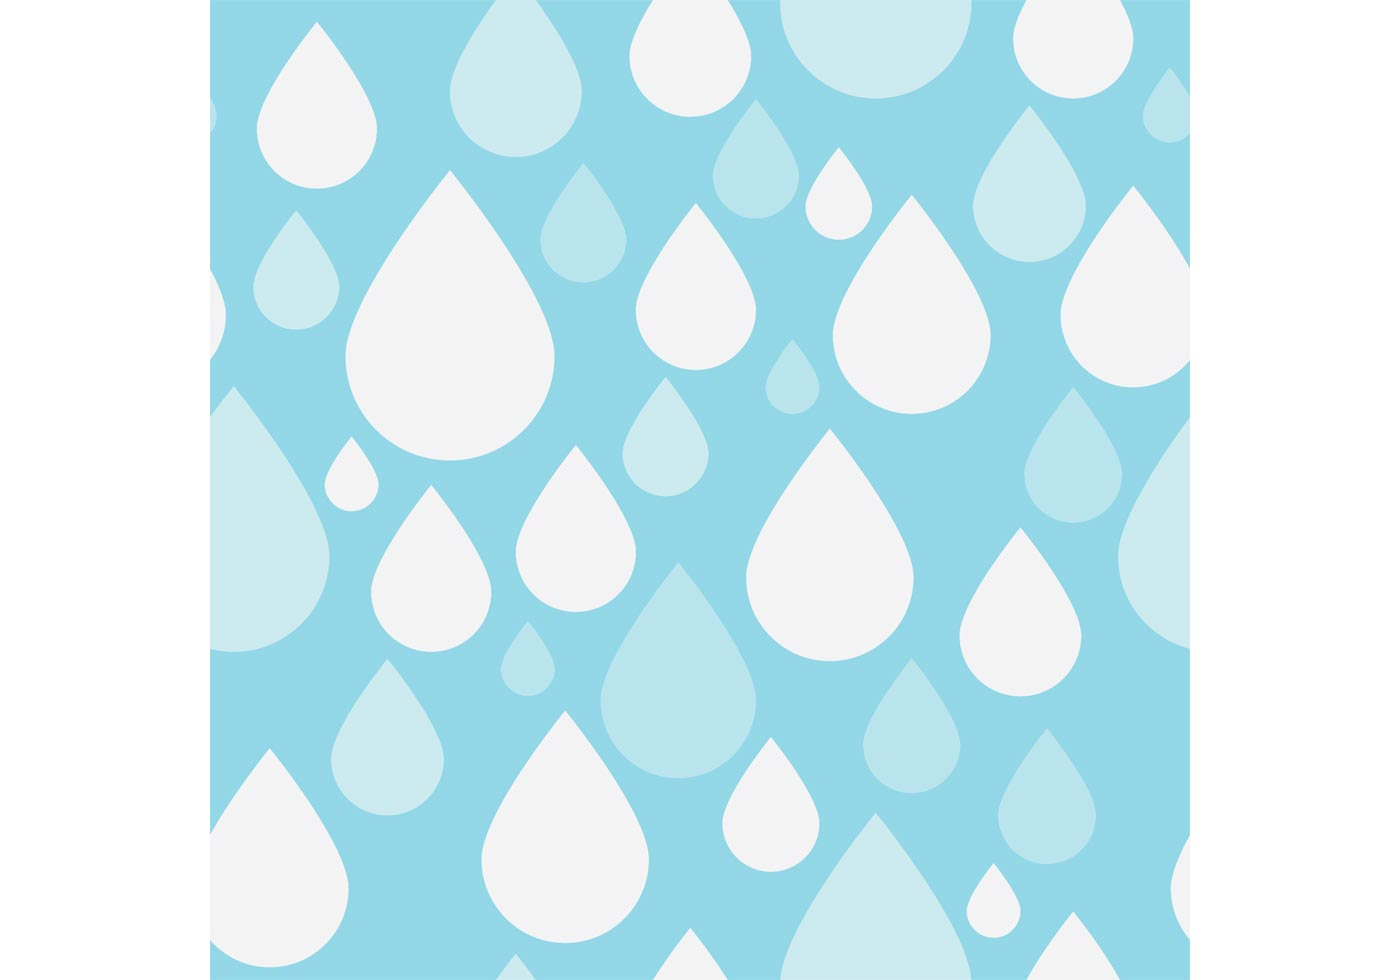 Pattern Vector of Simple Rain Drops